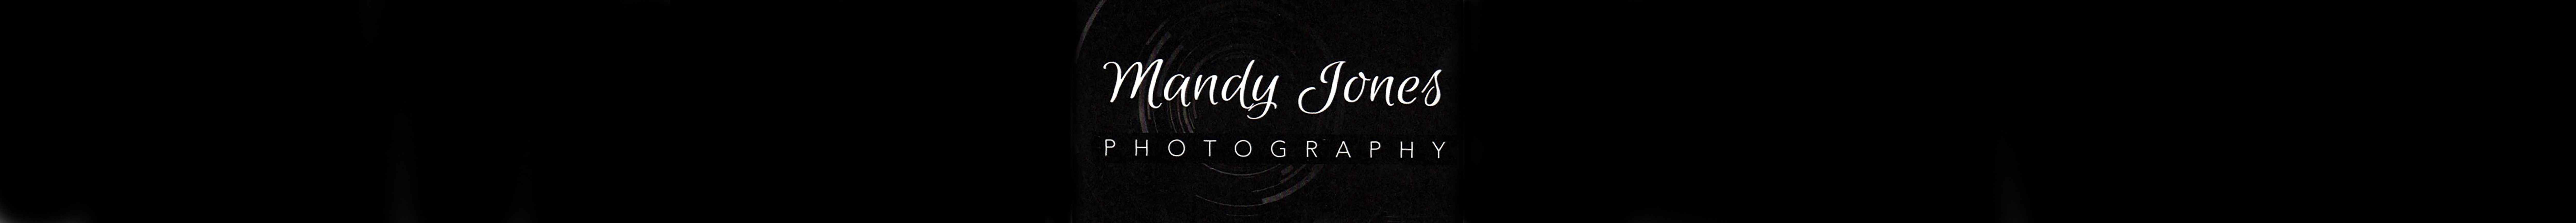 Mandy Jones Photography